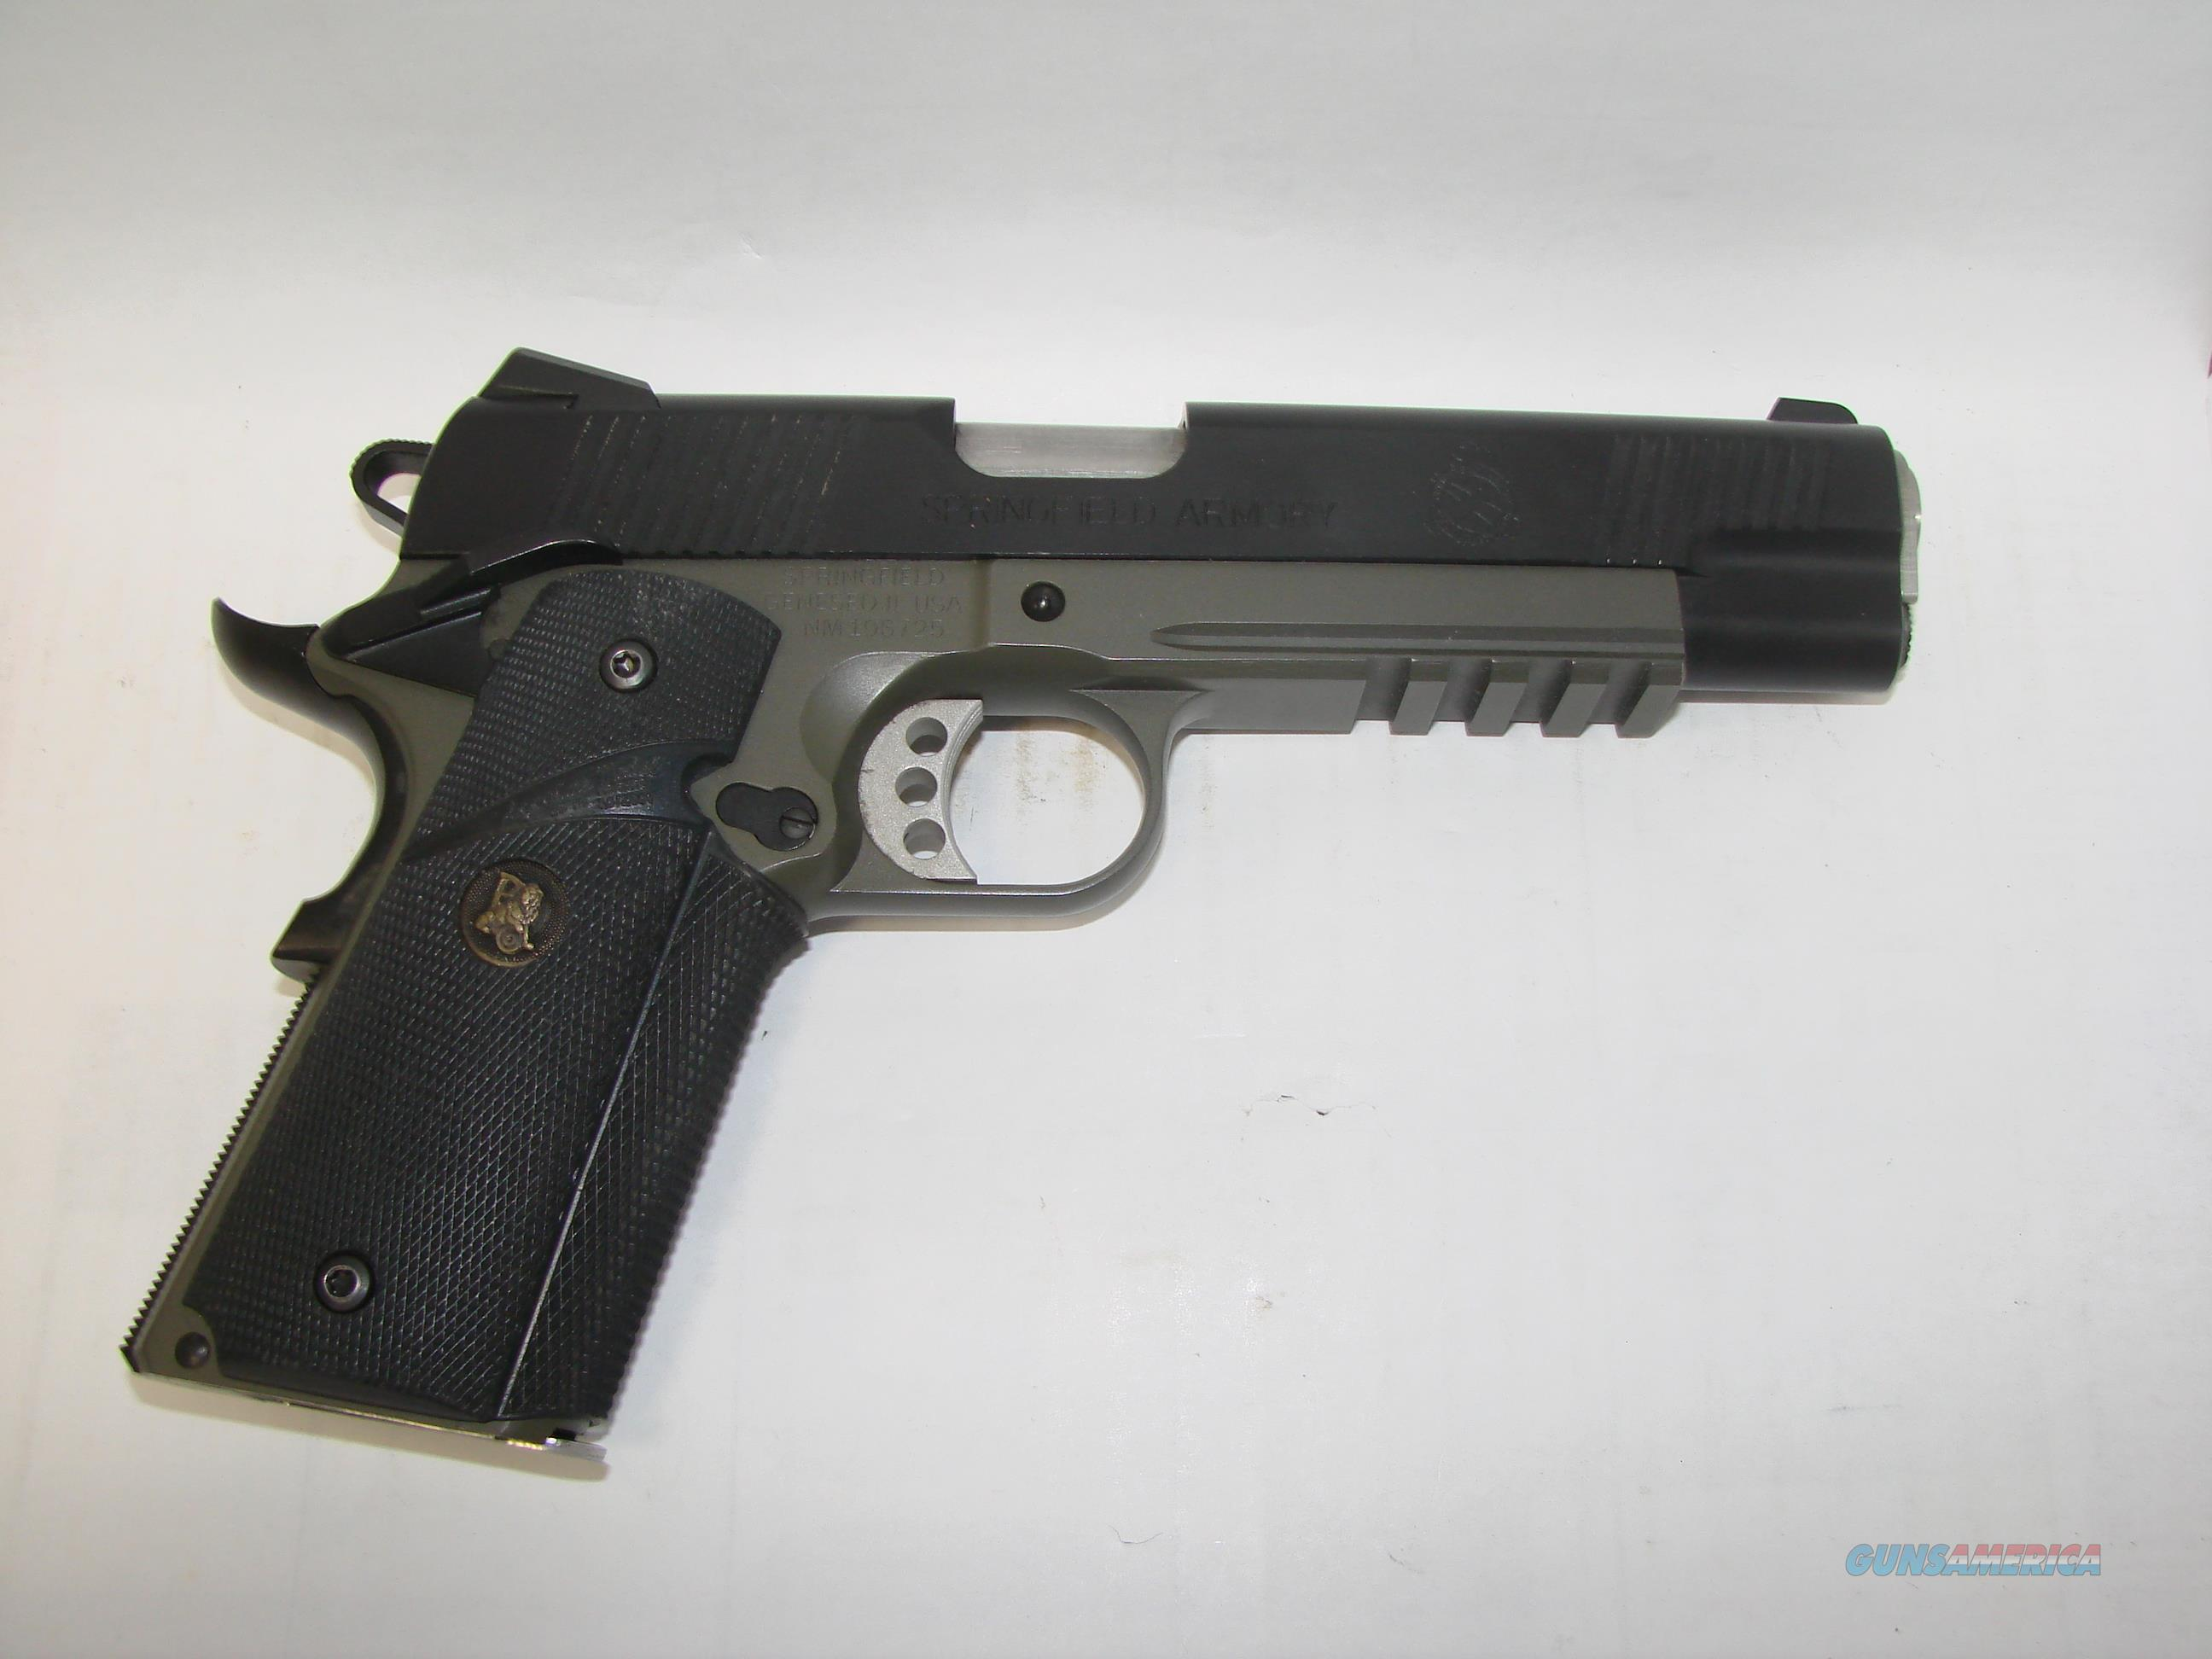 Springfield Operator 1911  Guns > Pistols > Springfield Armory Pistols > 1911 Type